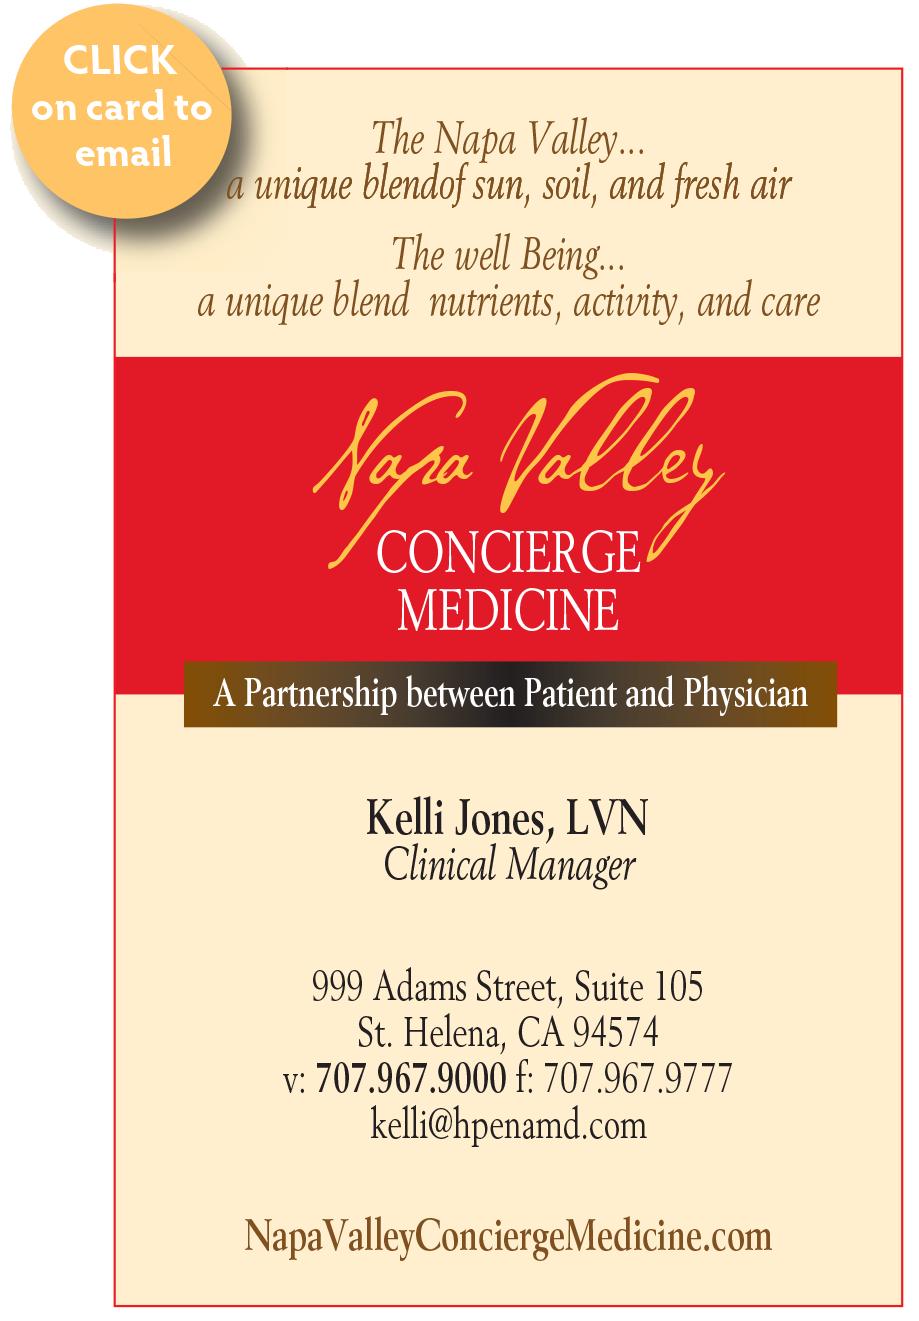 Kelli Jones LVN Clinical Manager